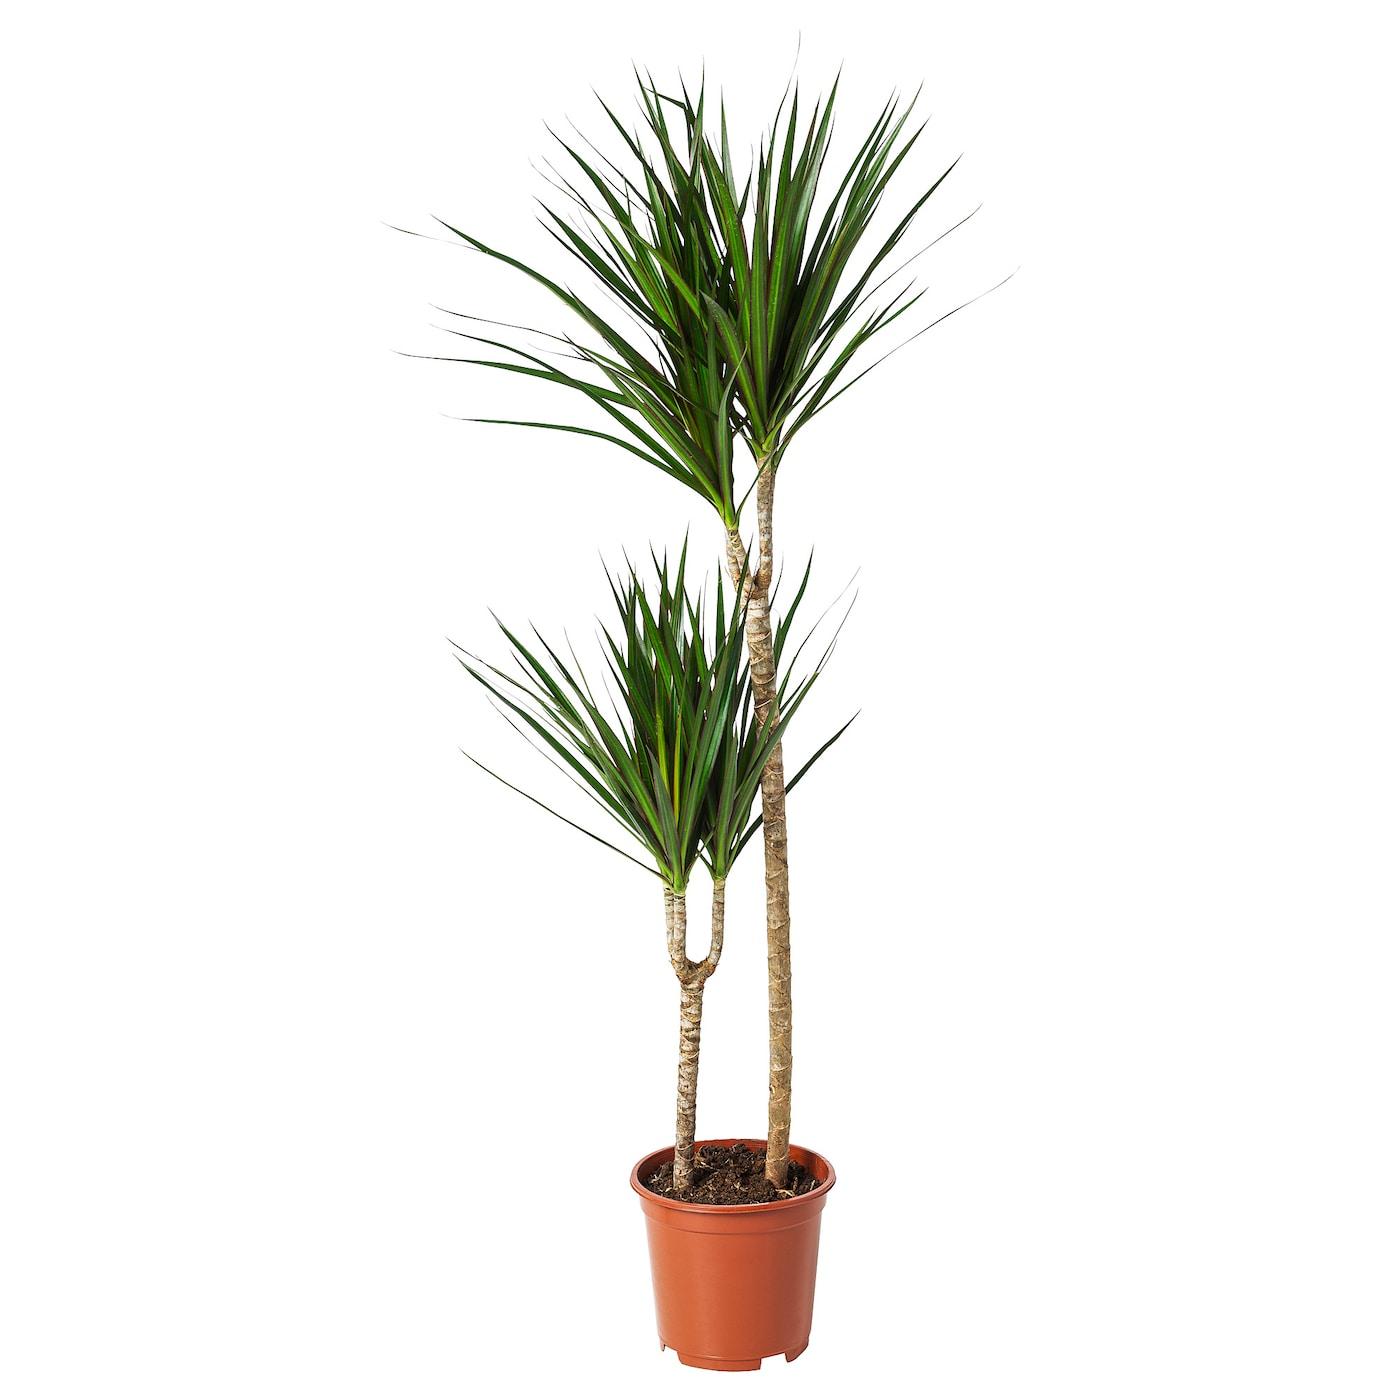 https://www.ikea.com/gb/en/images/products/dracaena-marginata-potted-plant-dragon-tree-2-stem__0653993_pe708222_s5.jpg Dracaena